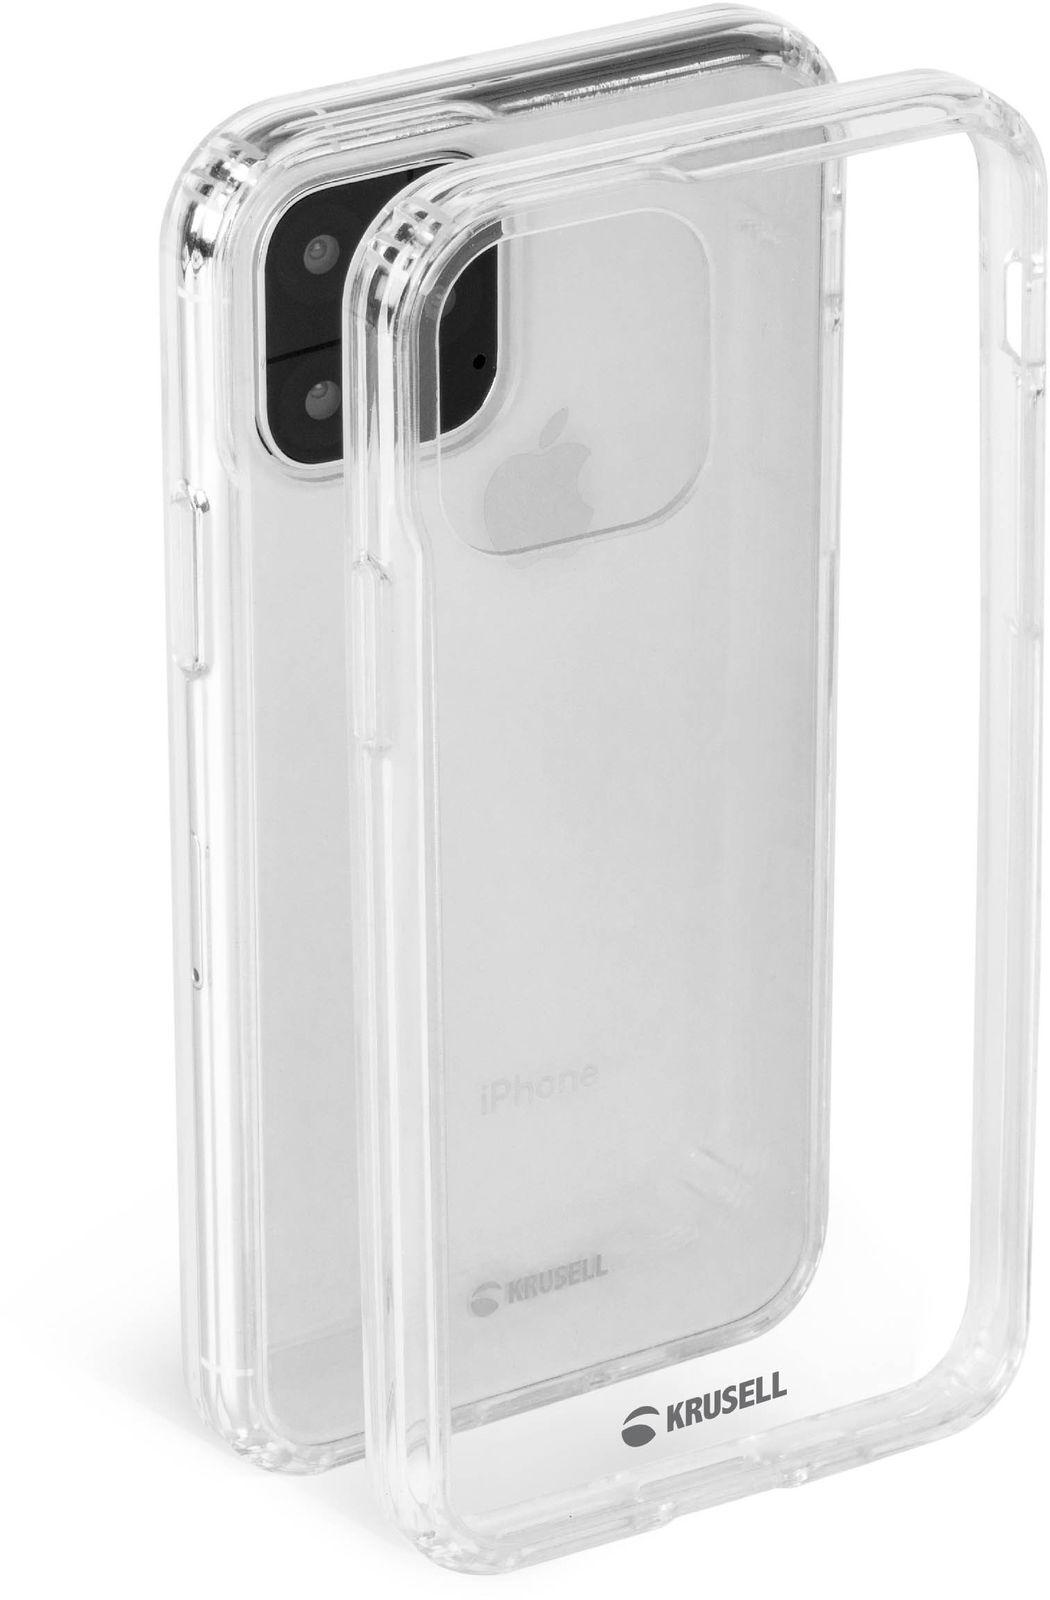 Krusell Kivik Cover iPhone 11 Pro Transparent 61771X - eet01